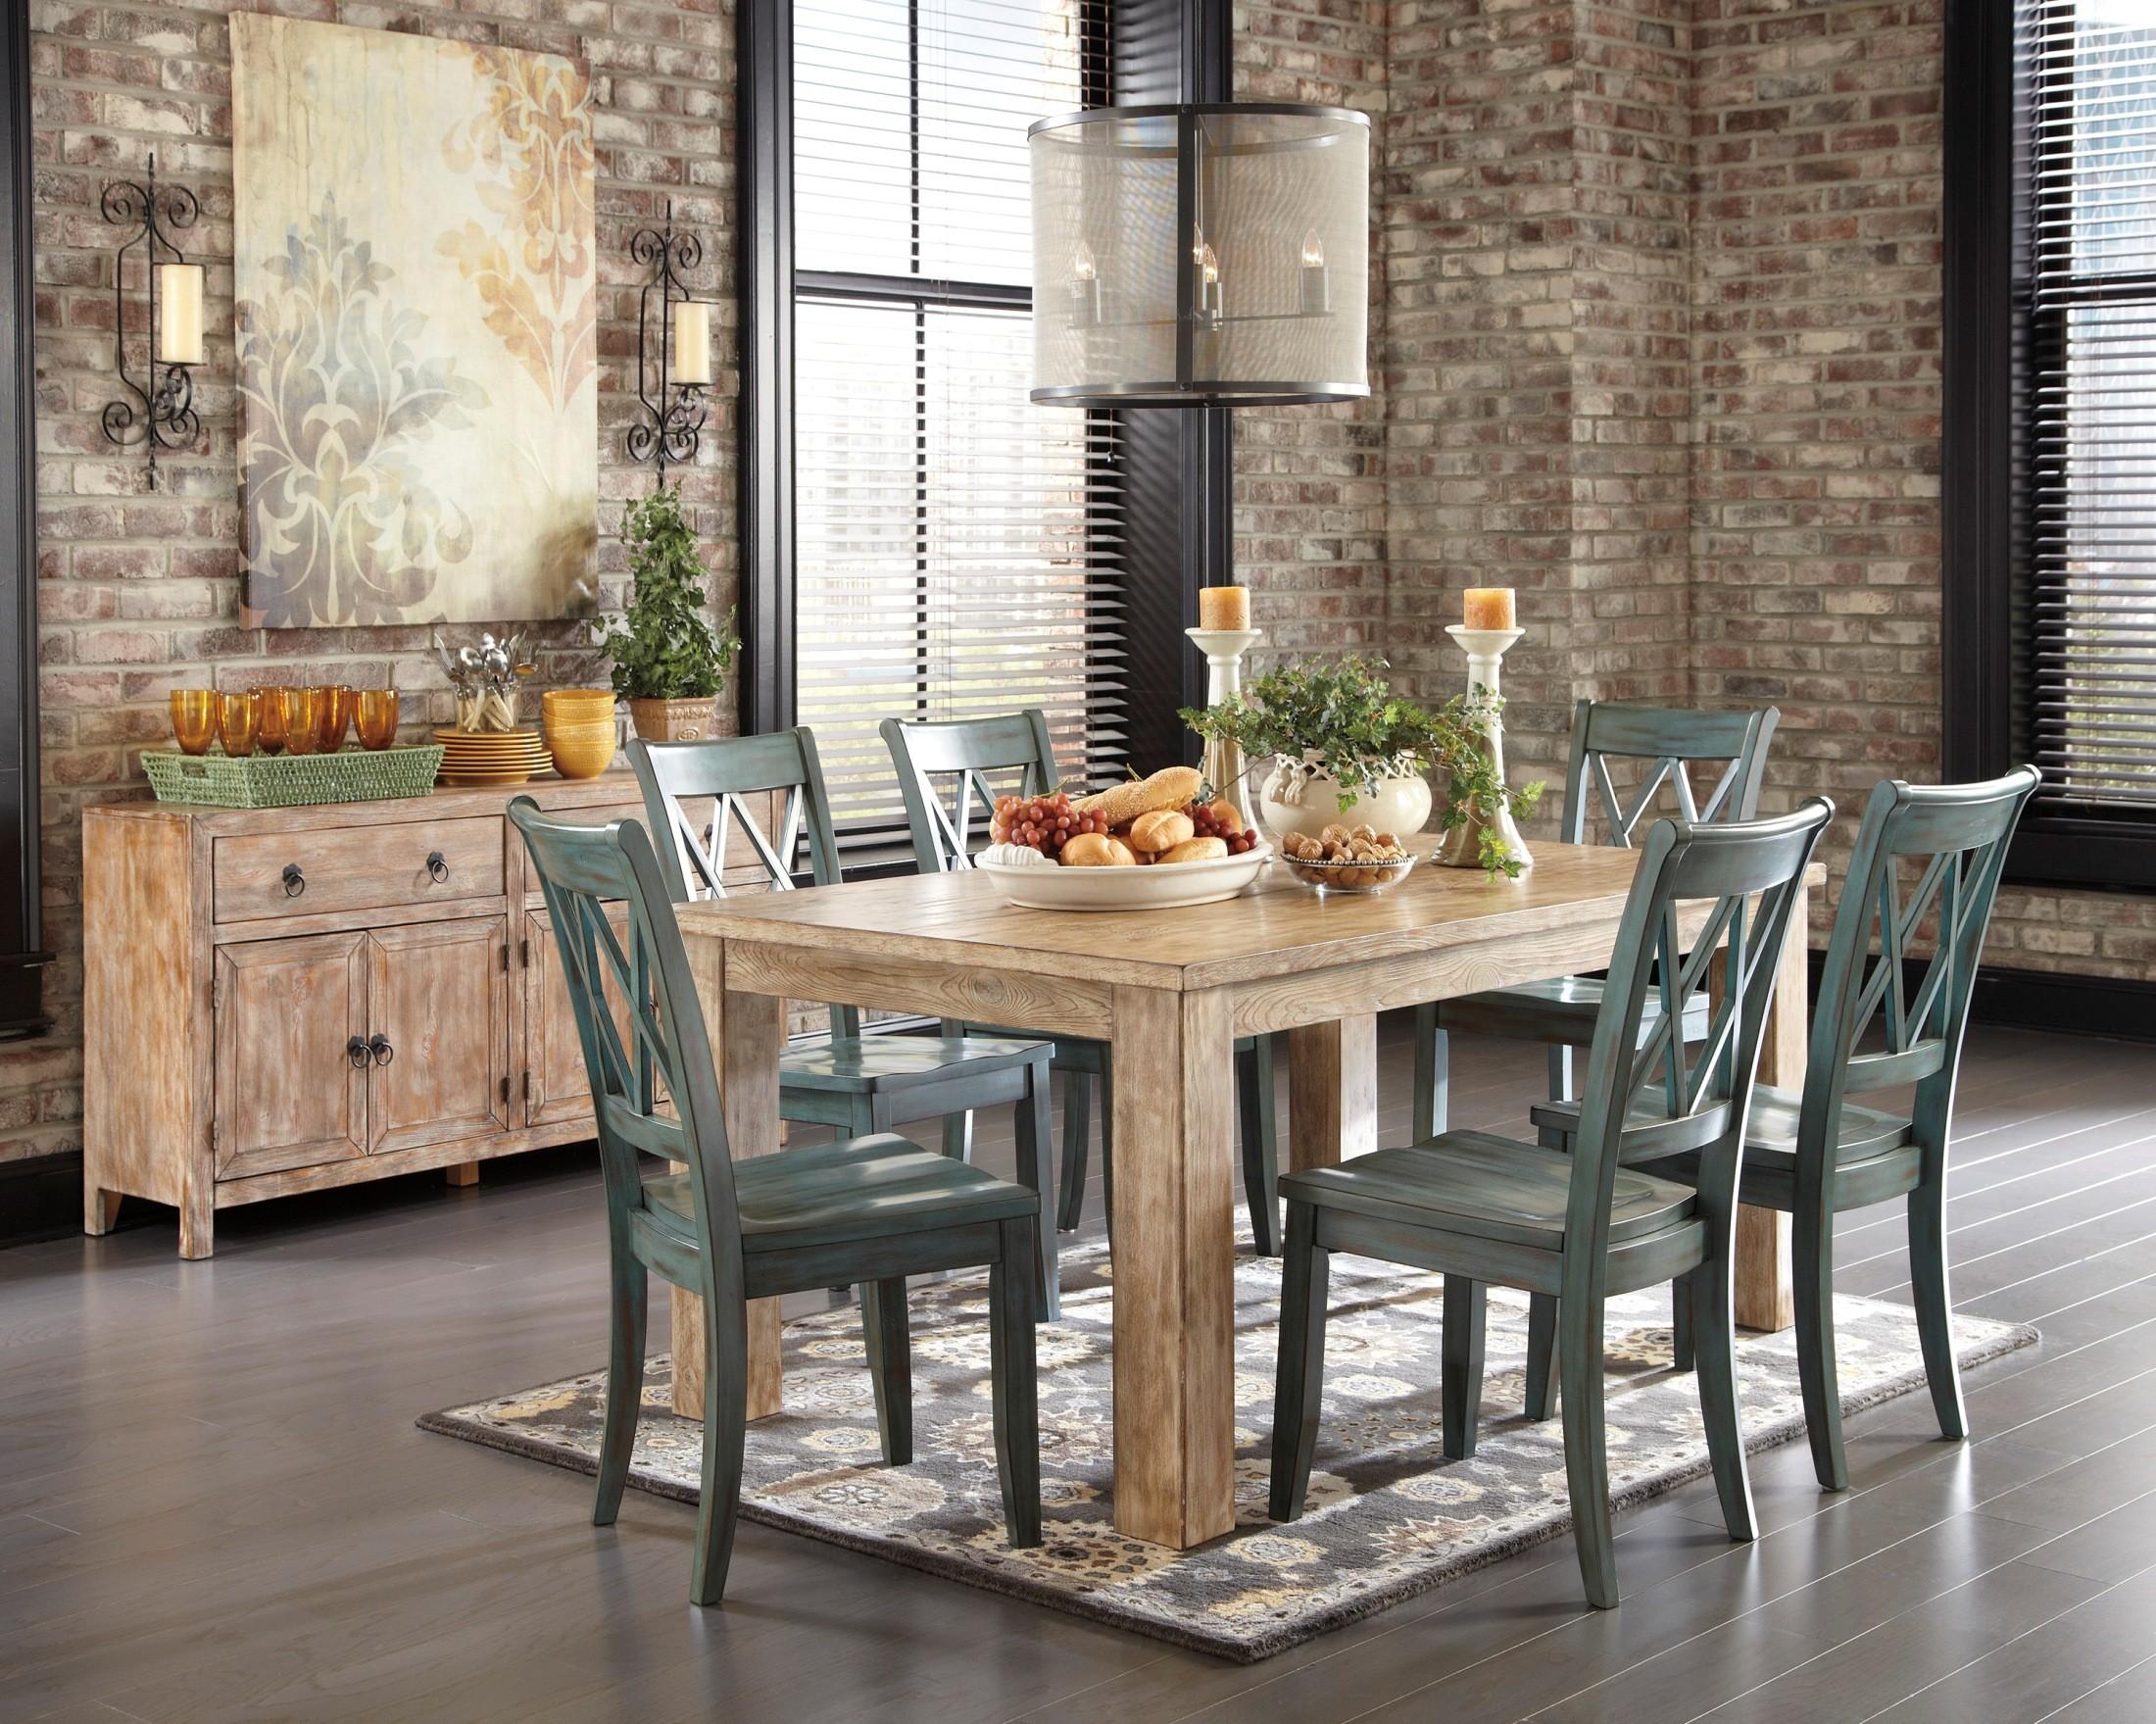 Mestler Driftwood Dining Room Set From Ashley (D540-225